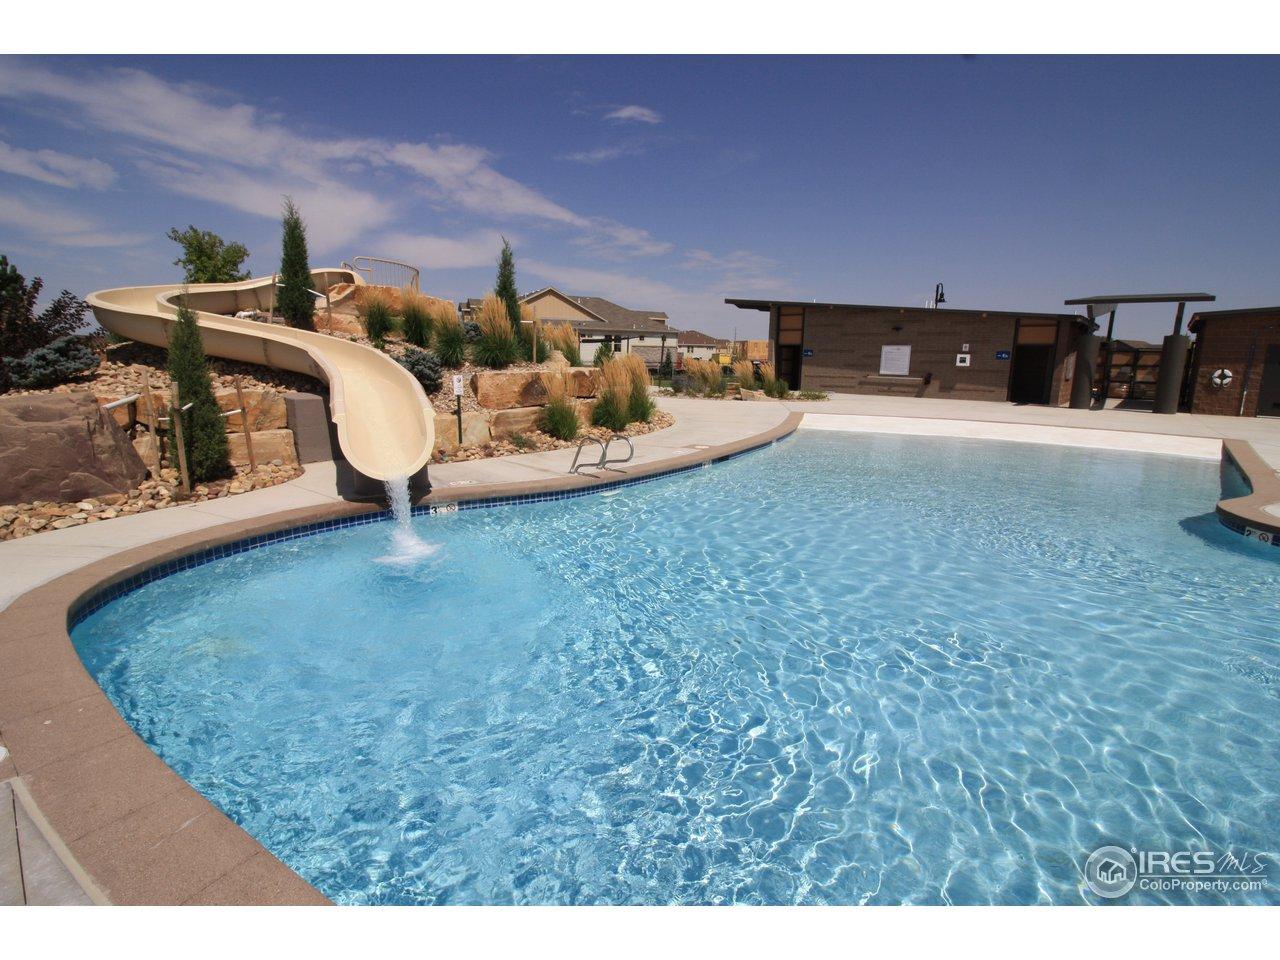 Awesome community pool!